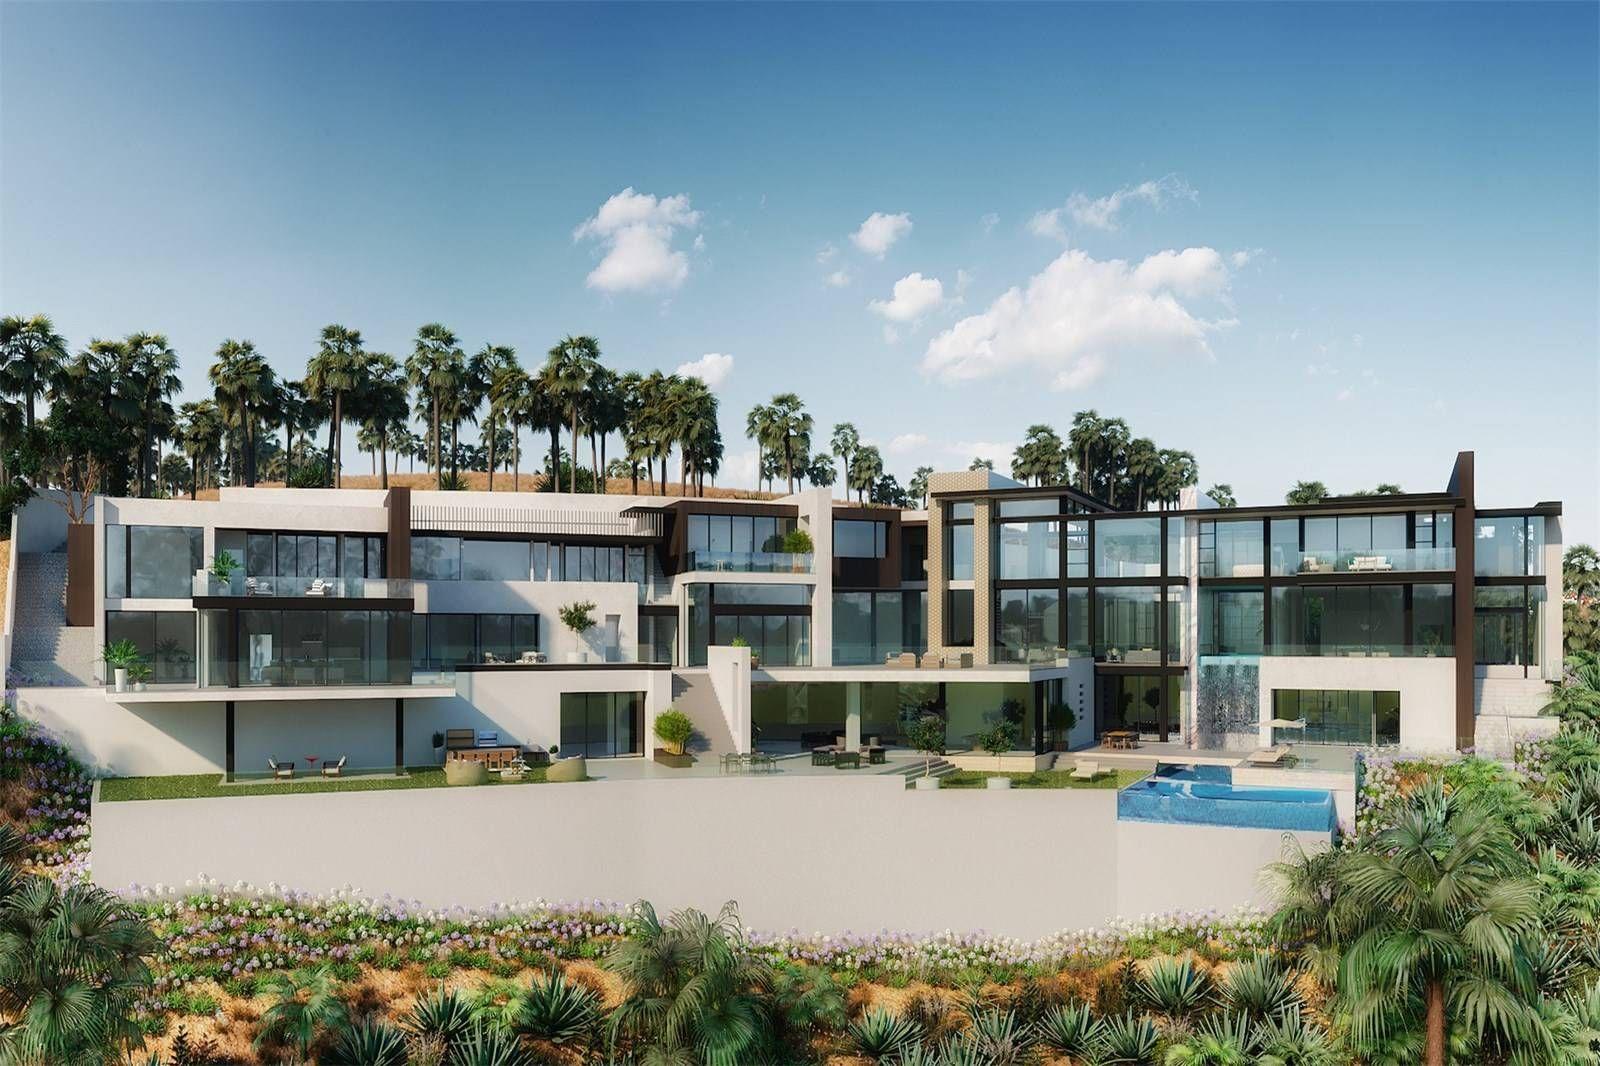 960 stradella road los angeles california united states luxury home for sale